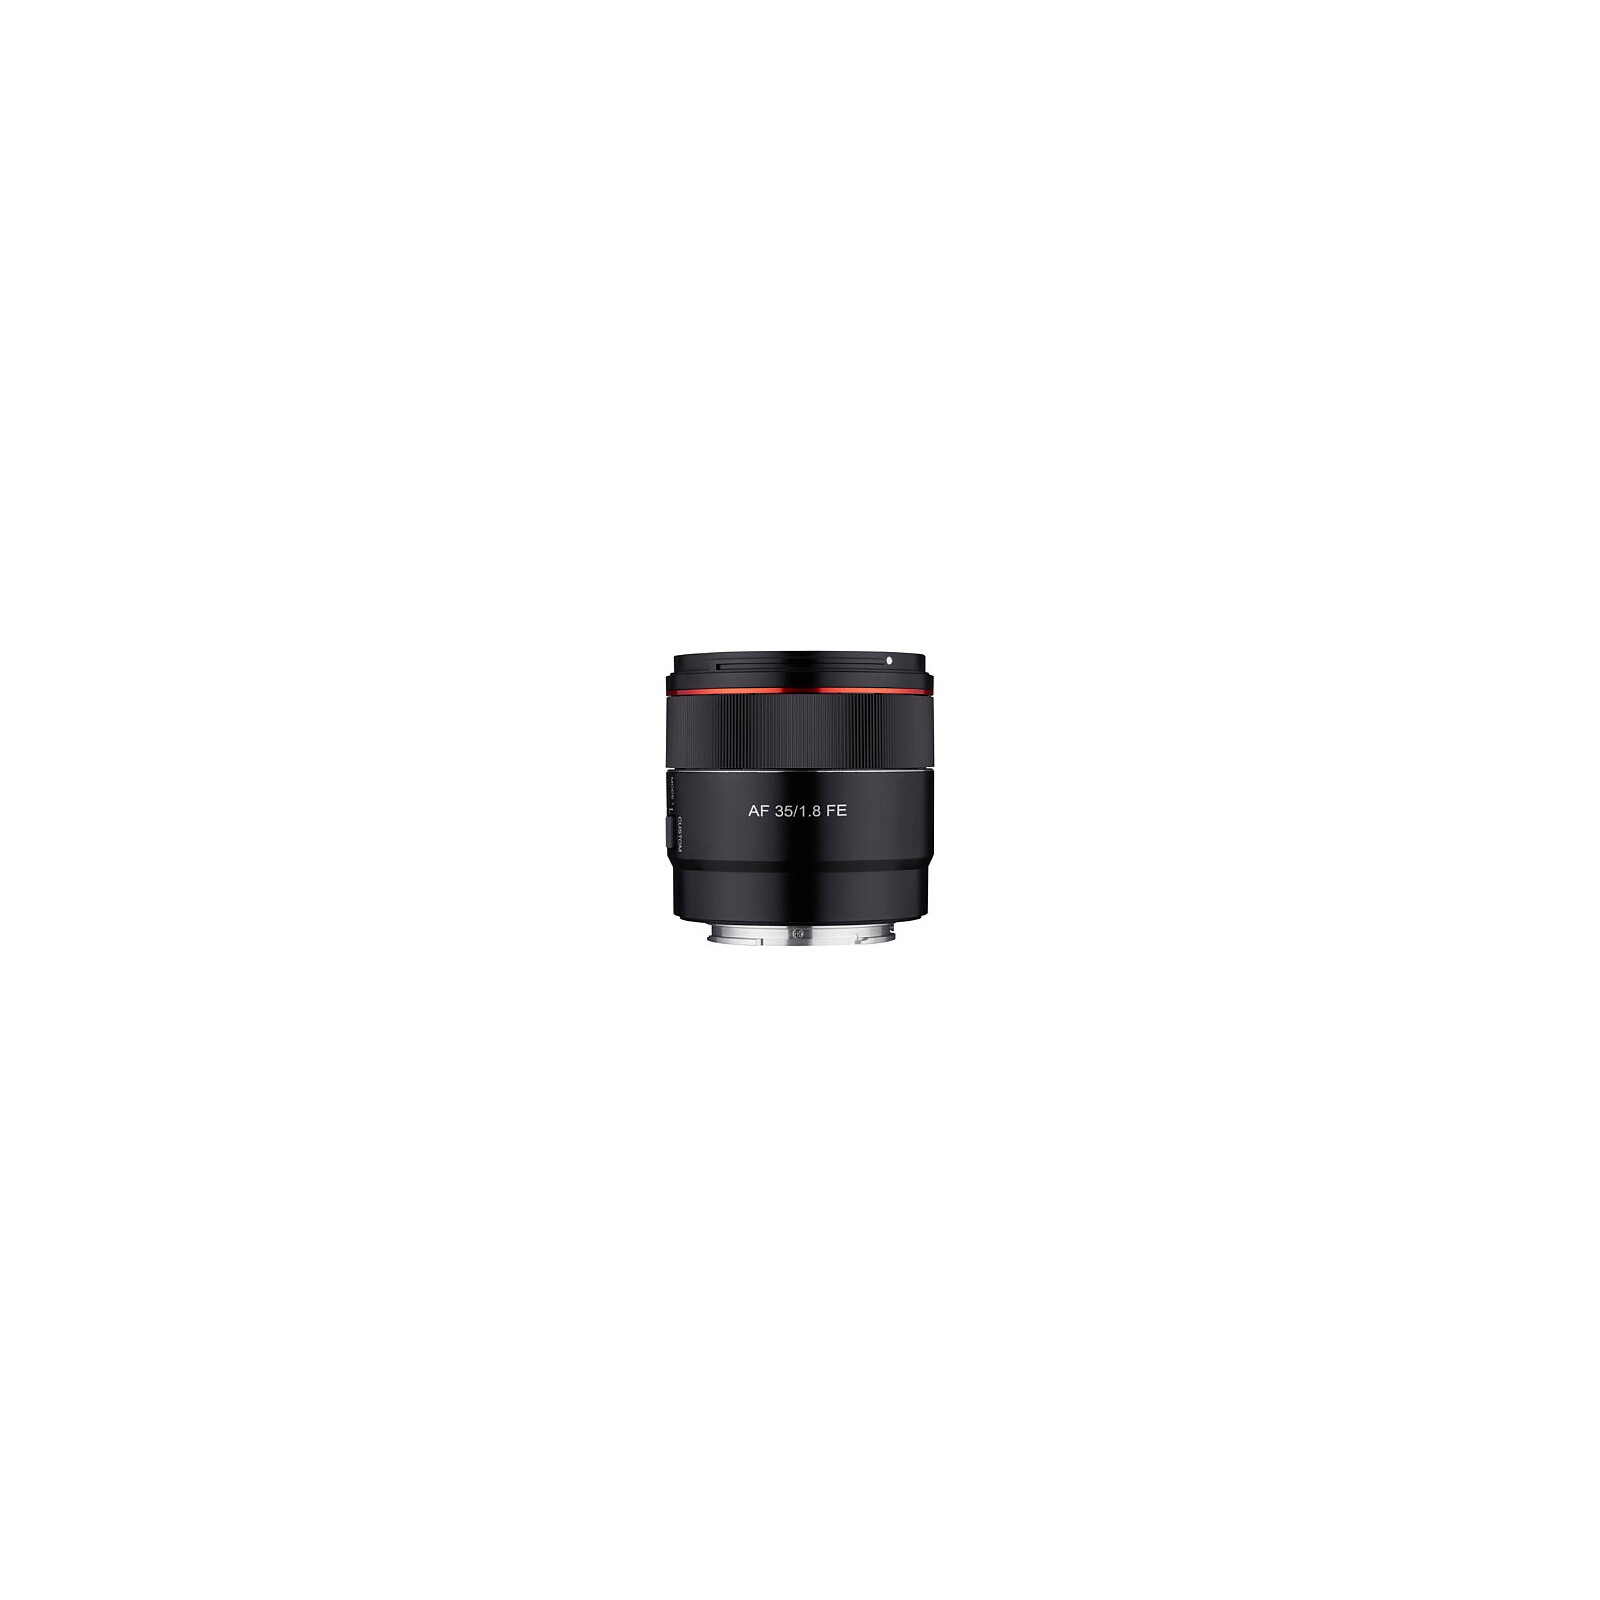 Samyang AF 35/1,8 FE für Sony E - Tiny but All around